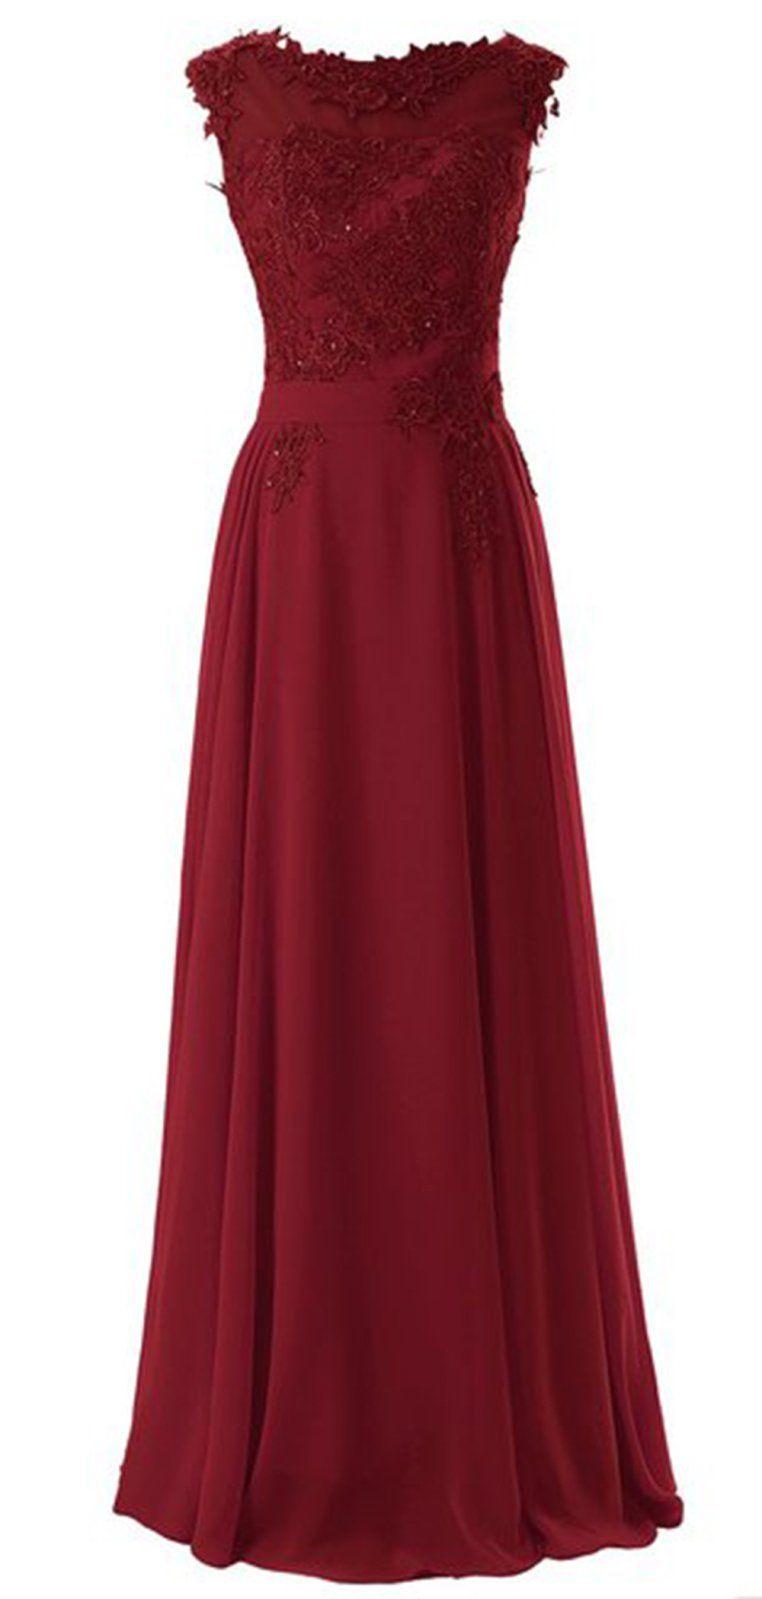 15 Schön Abendkleid Bordeaux Lang Vertrieb17 Elegant Abendkleid Bordeaux Lang Spezialgebiet